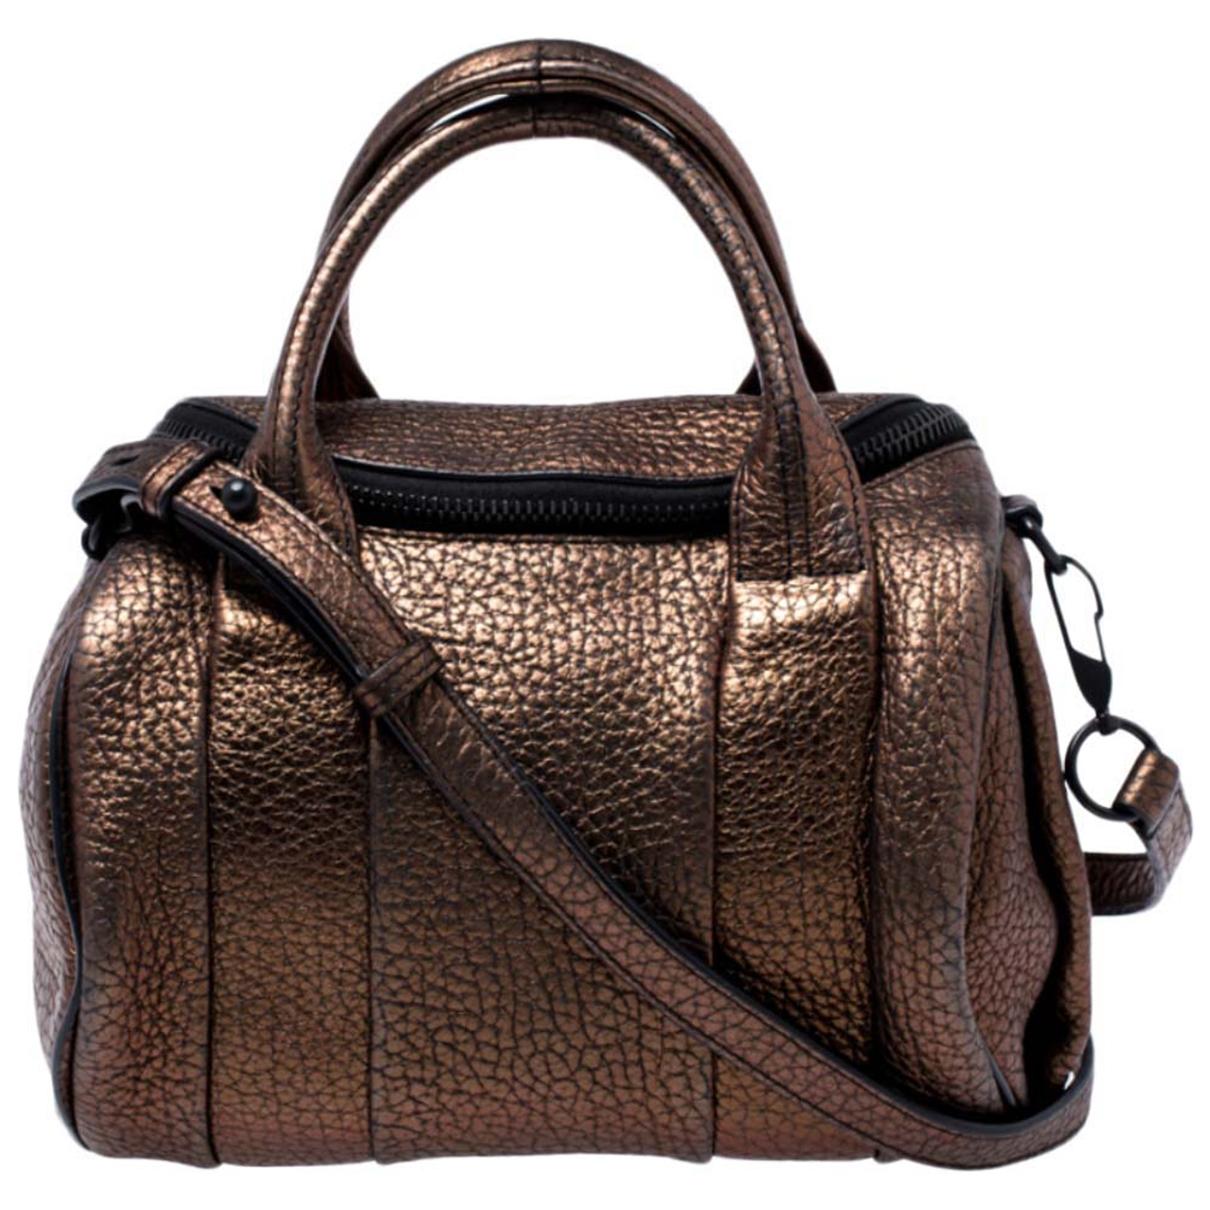 Alexander Wang Rockie Metallic Leather handbag for Women \N